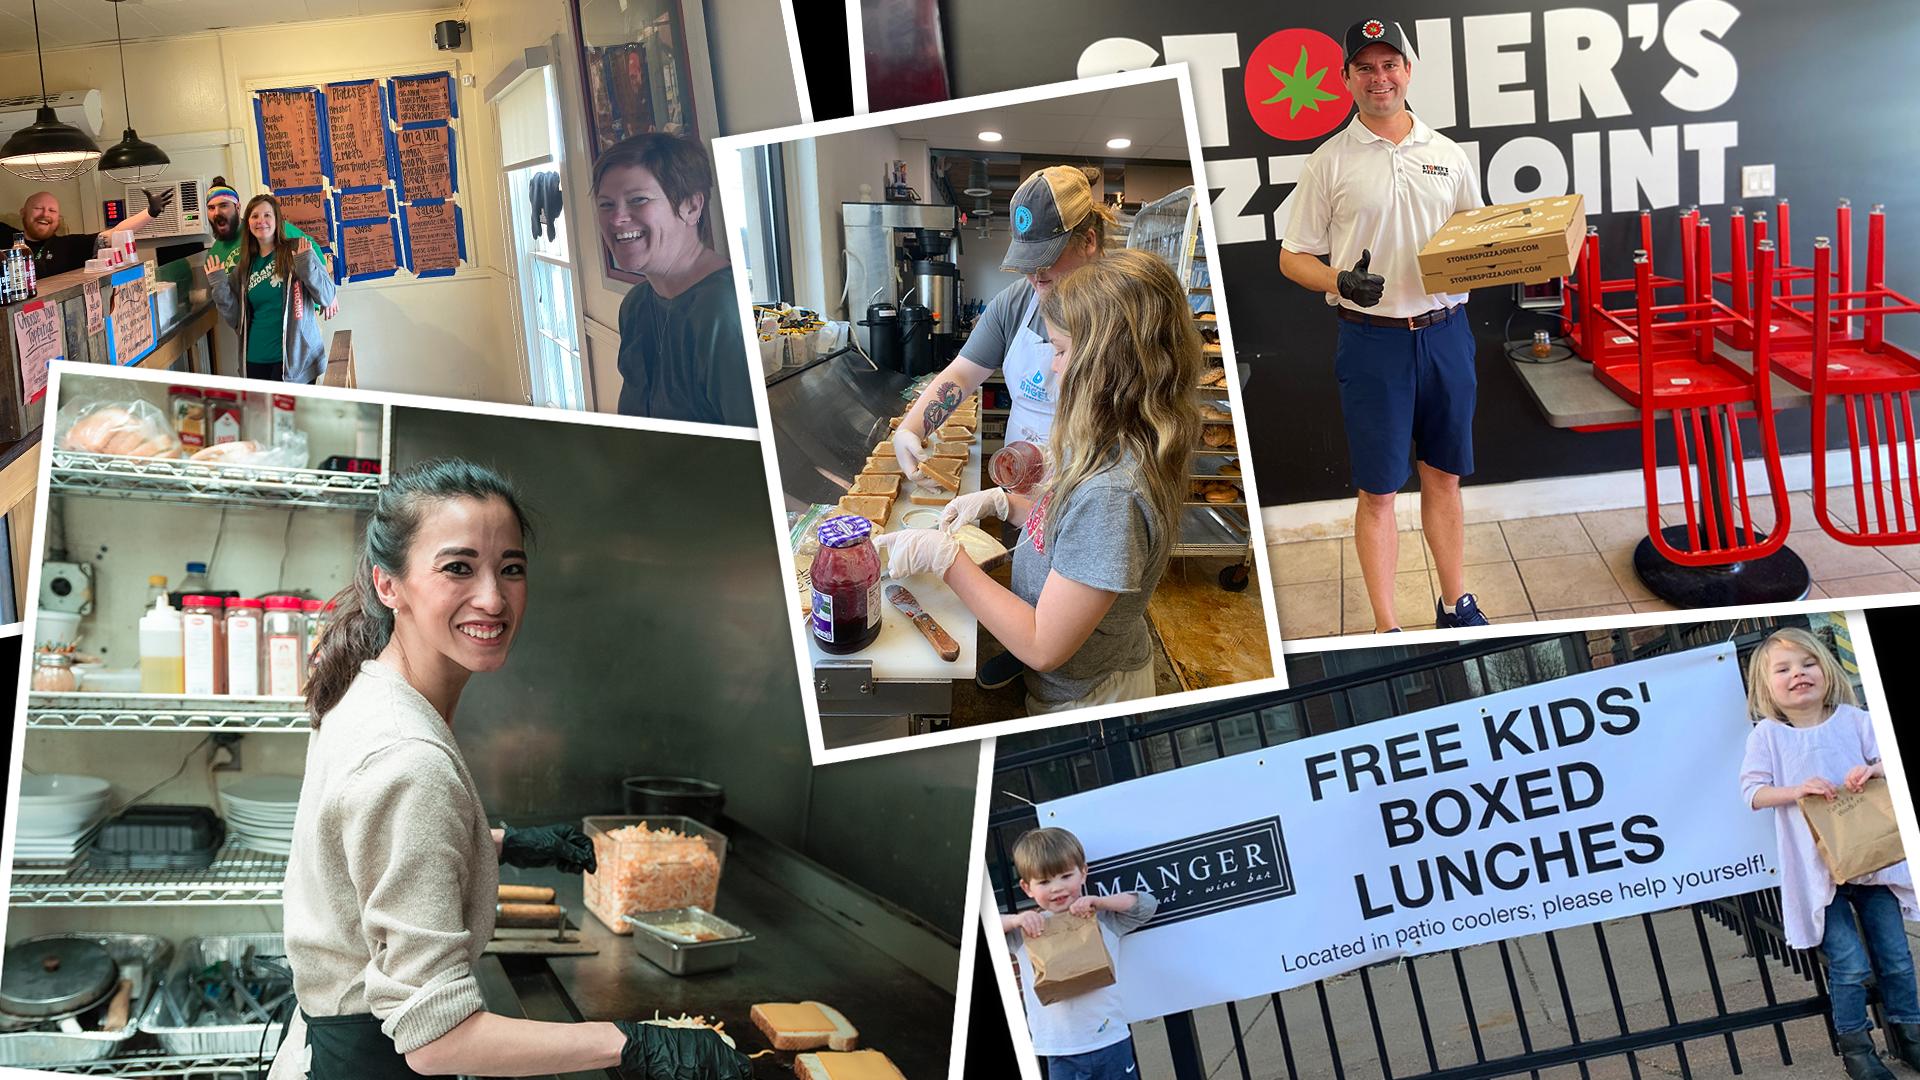 Restaurants feed kids for free during coronavirus pandemic